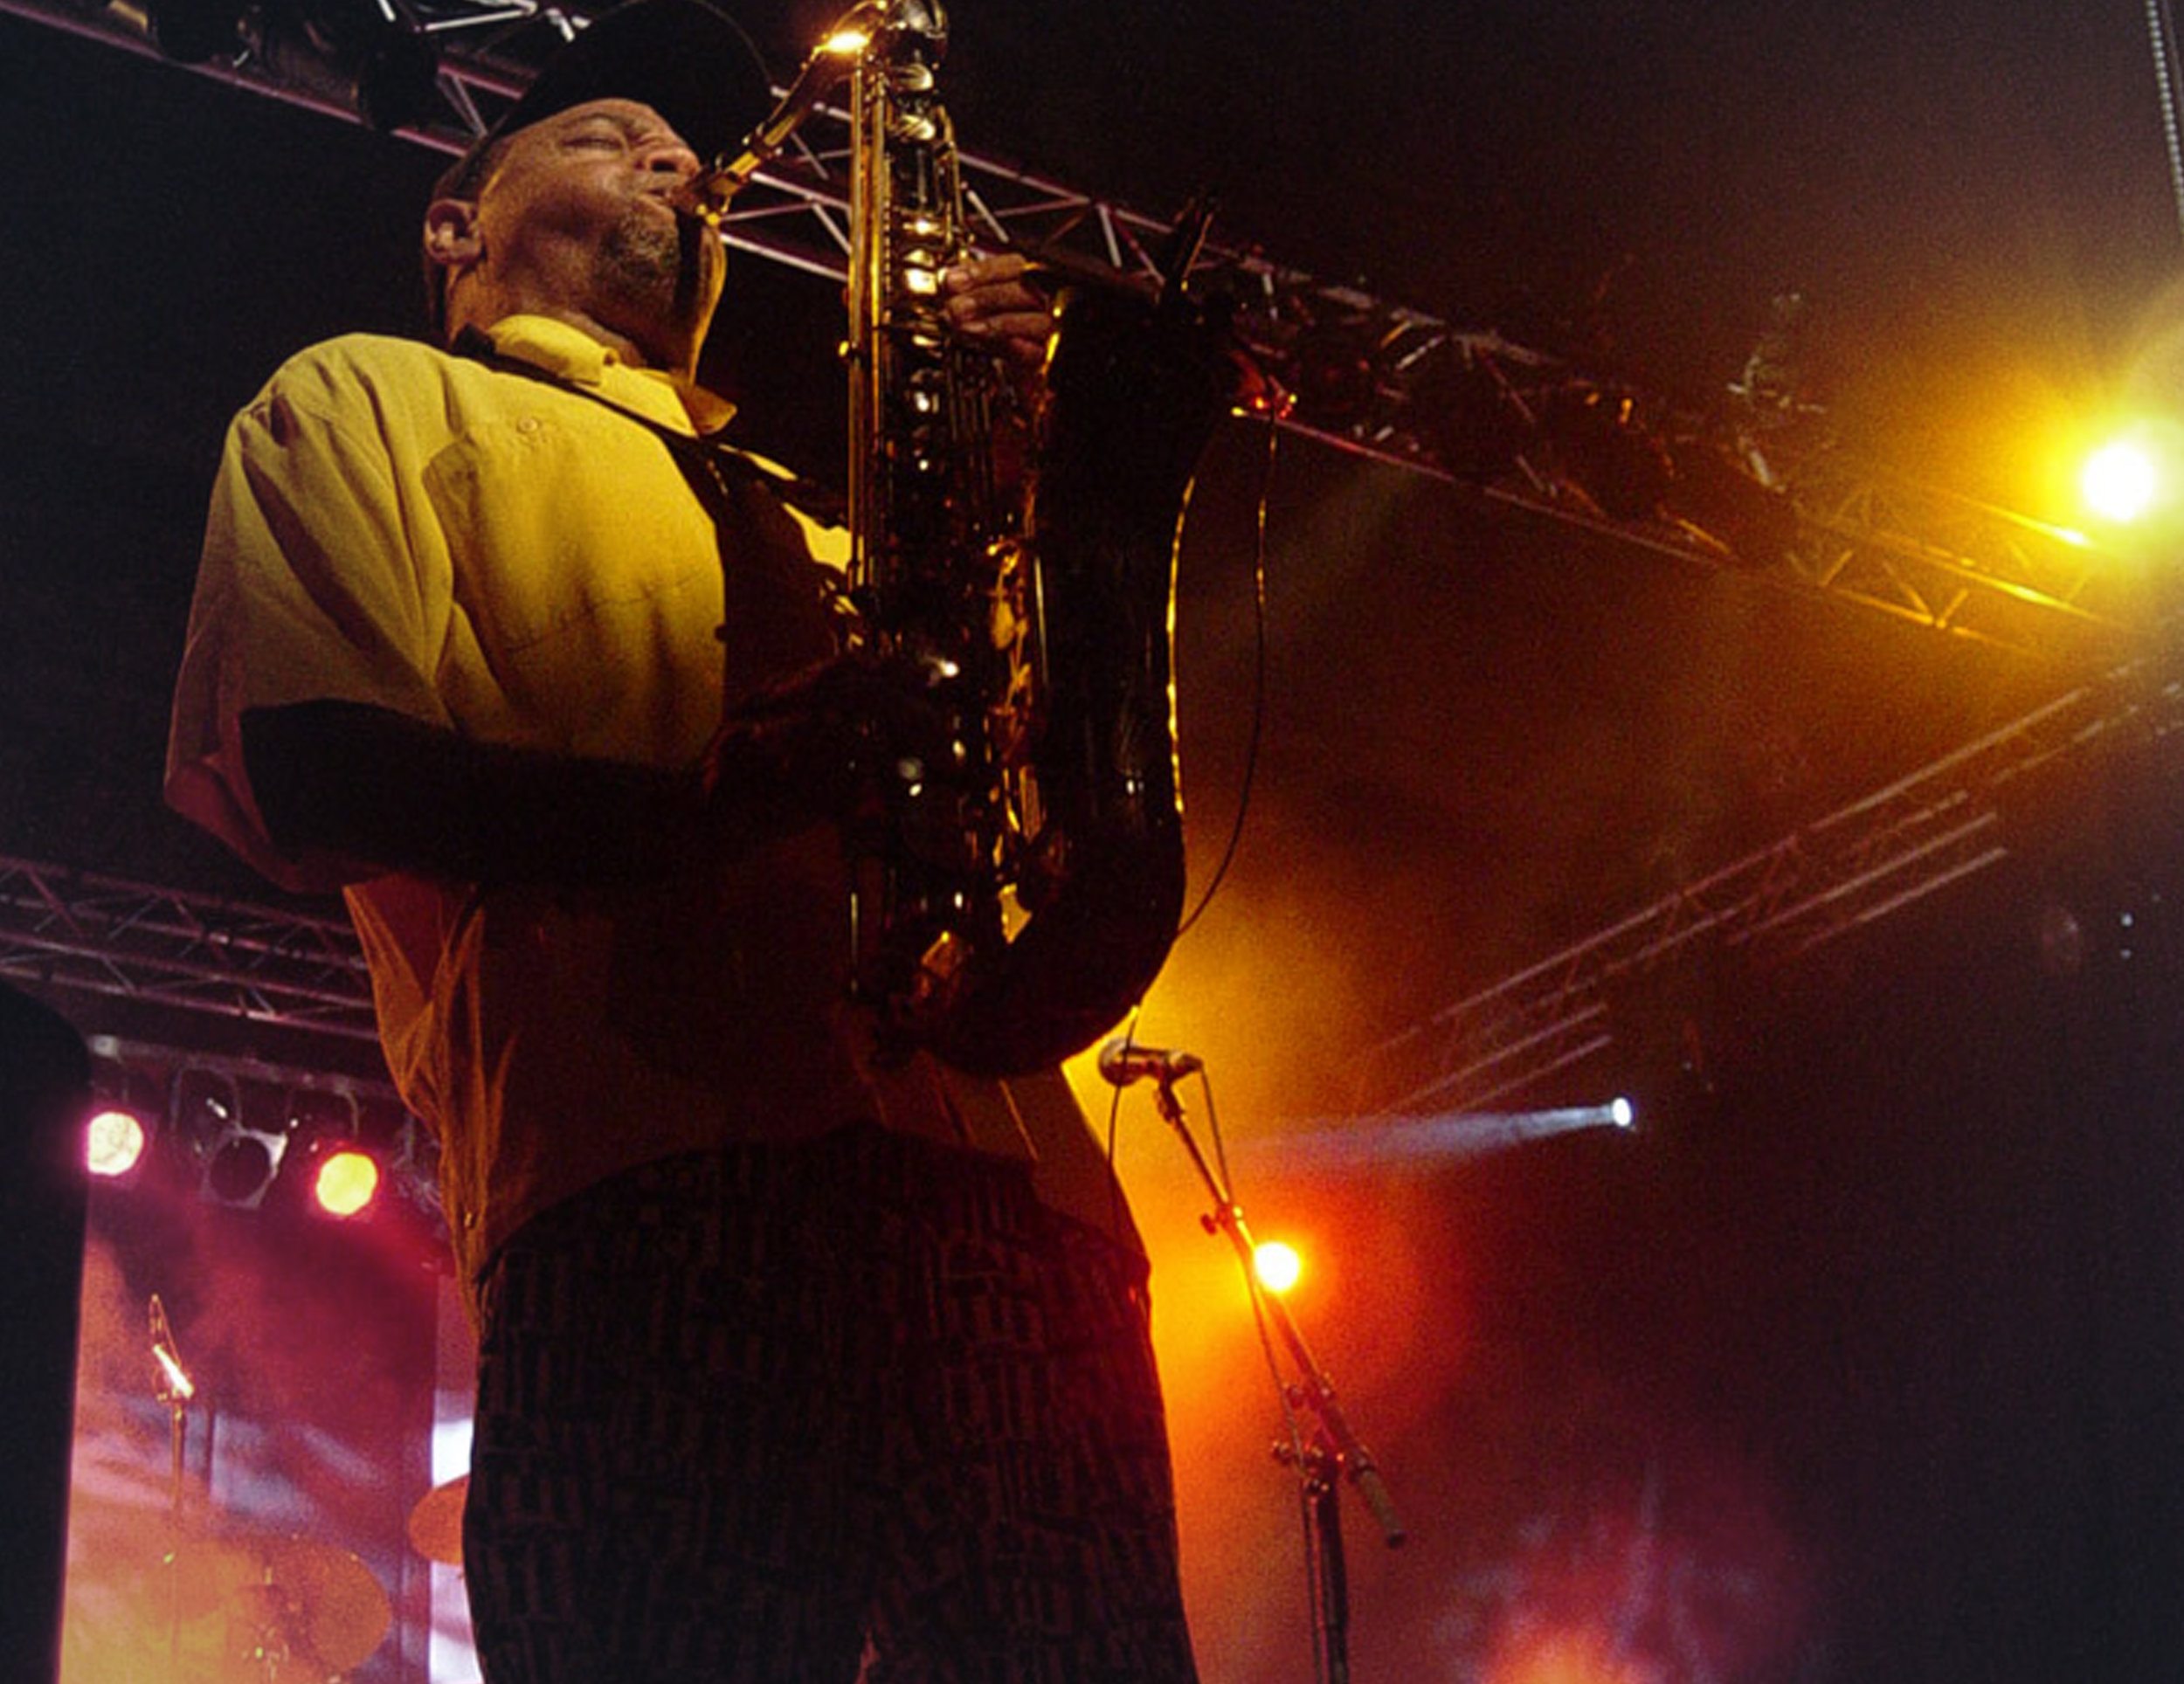 Saxophone and DJ Yorkshire